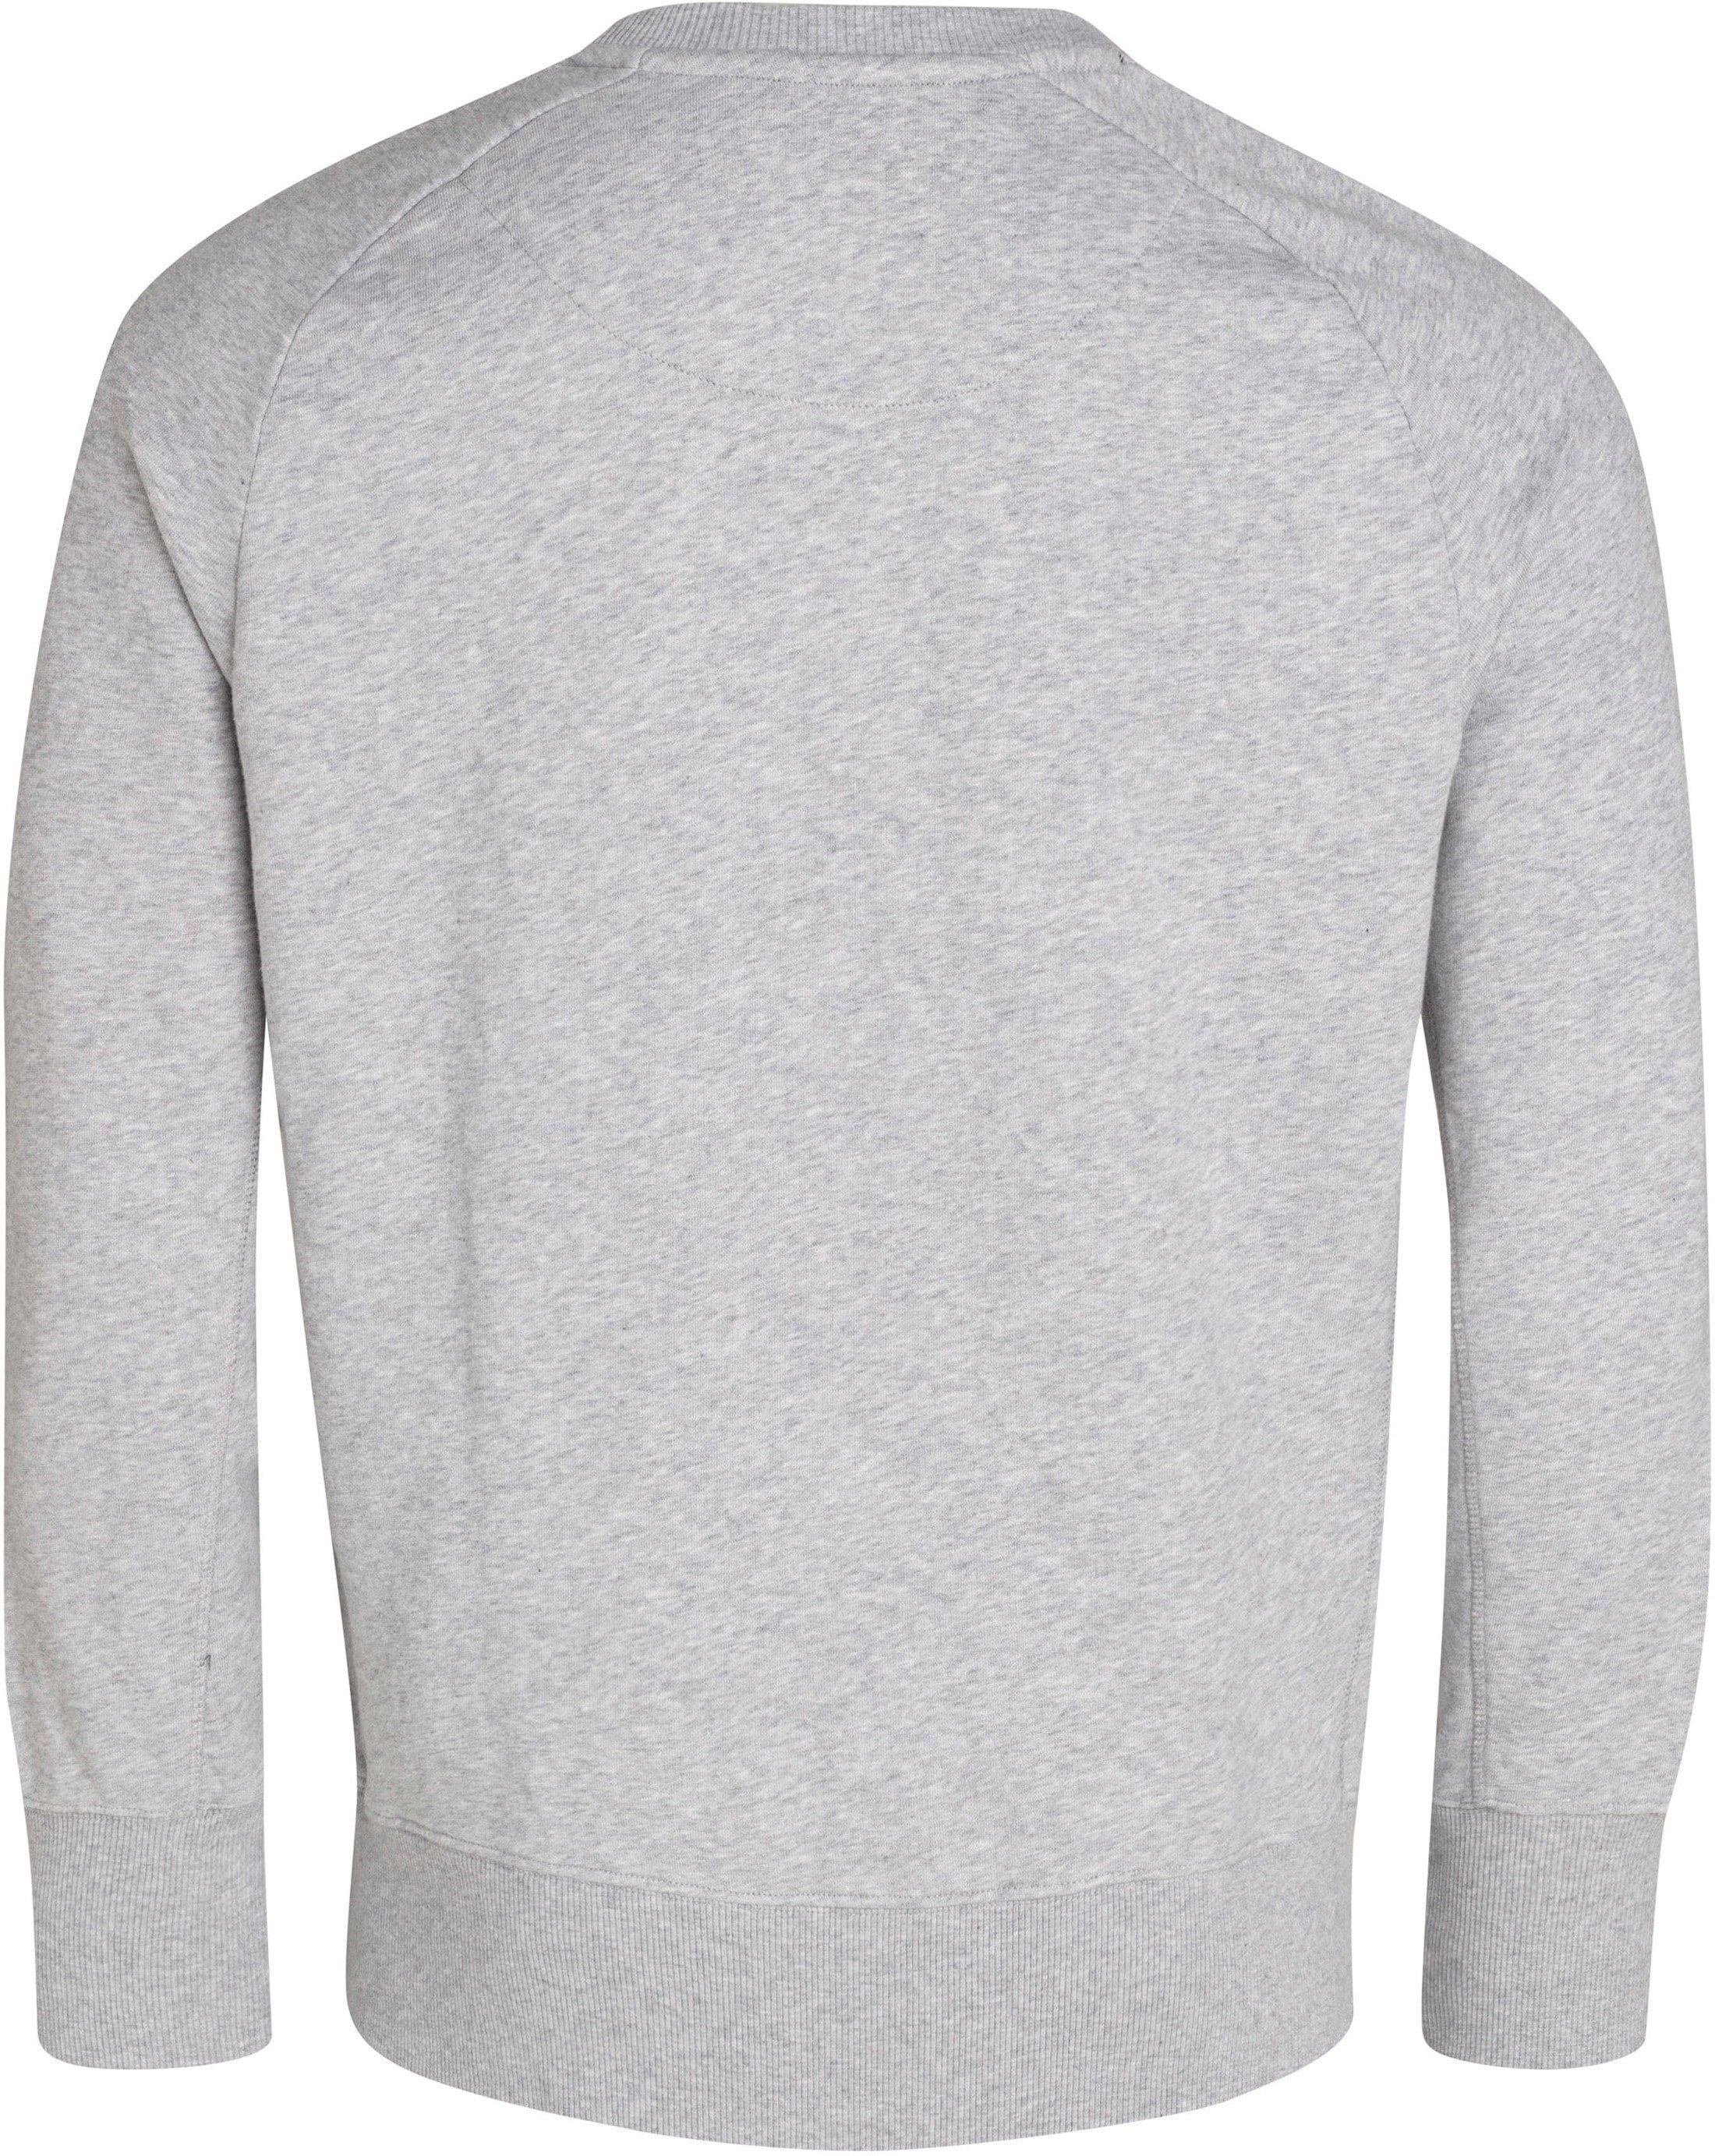 Bjorn Borg Crew Sweater Grau foto 2